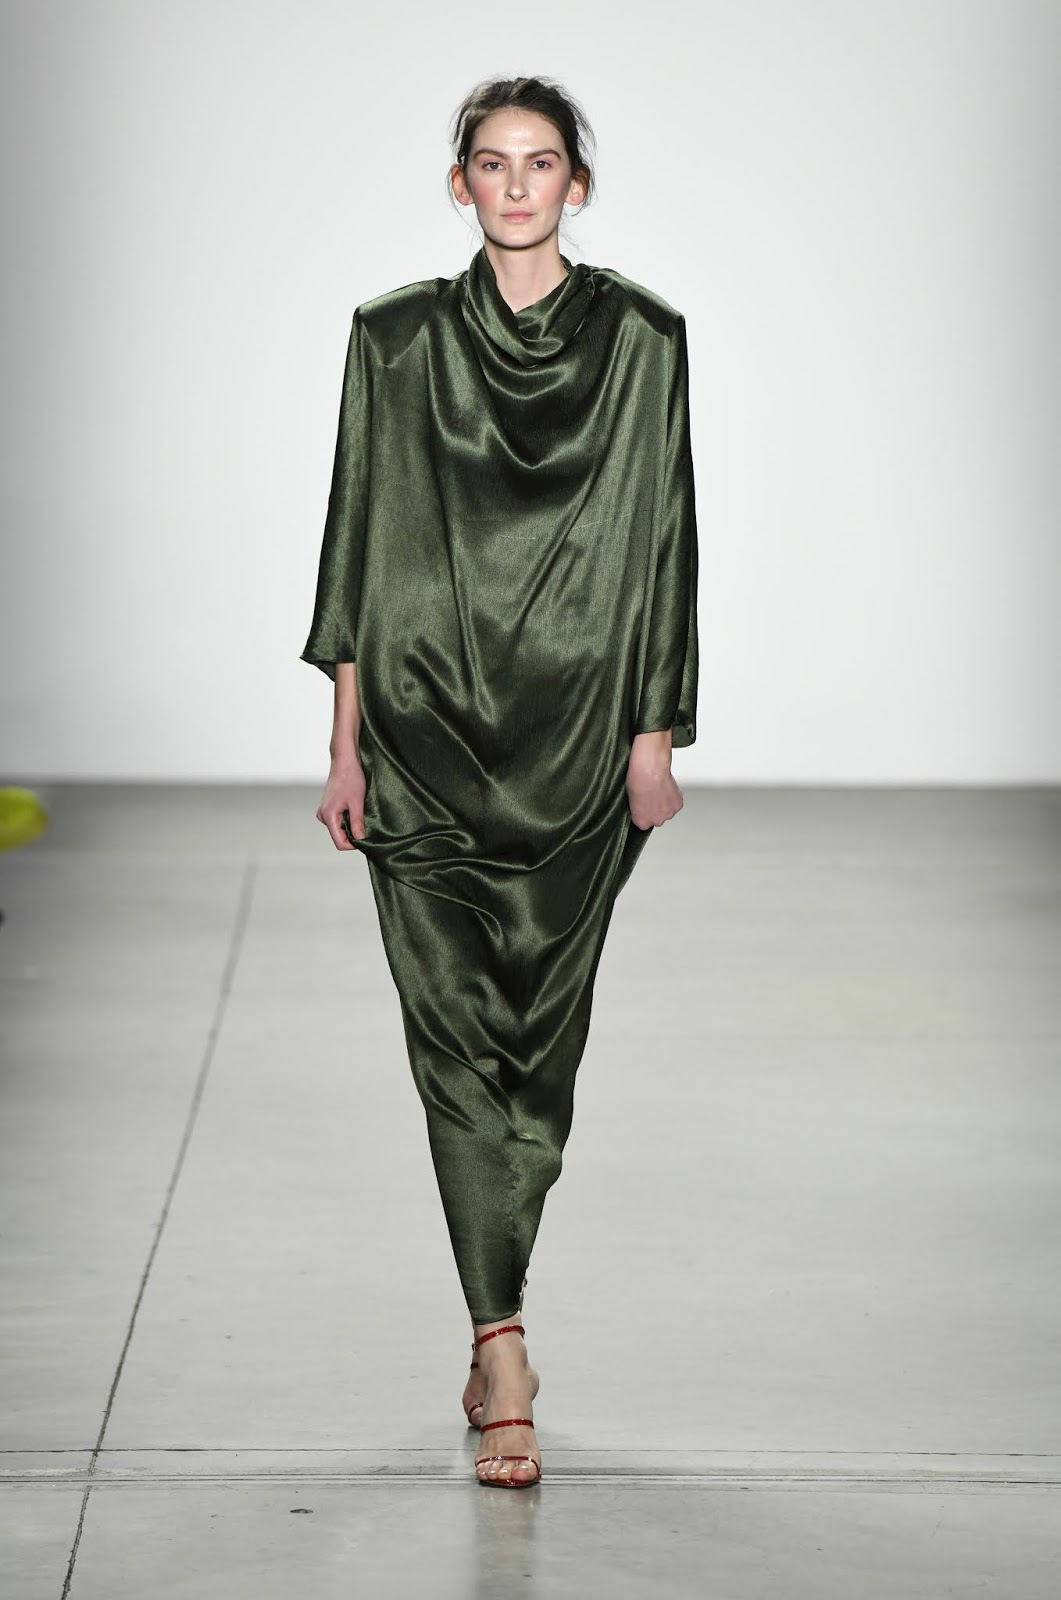 NYFW -Ghada Al Buainain and Harlienz by Mari Estilo-